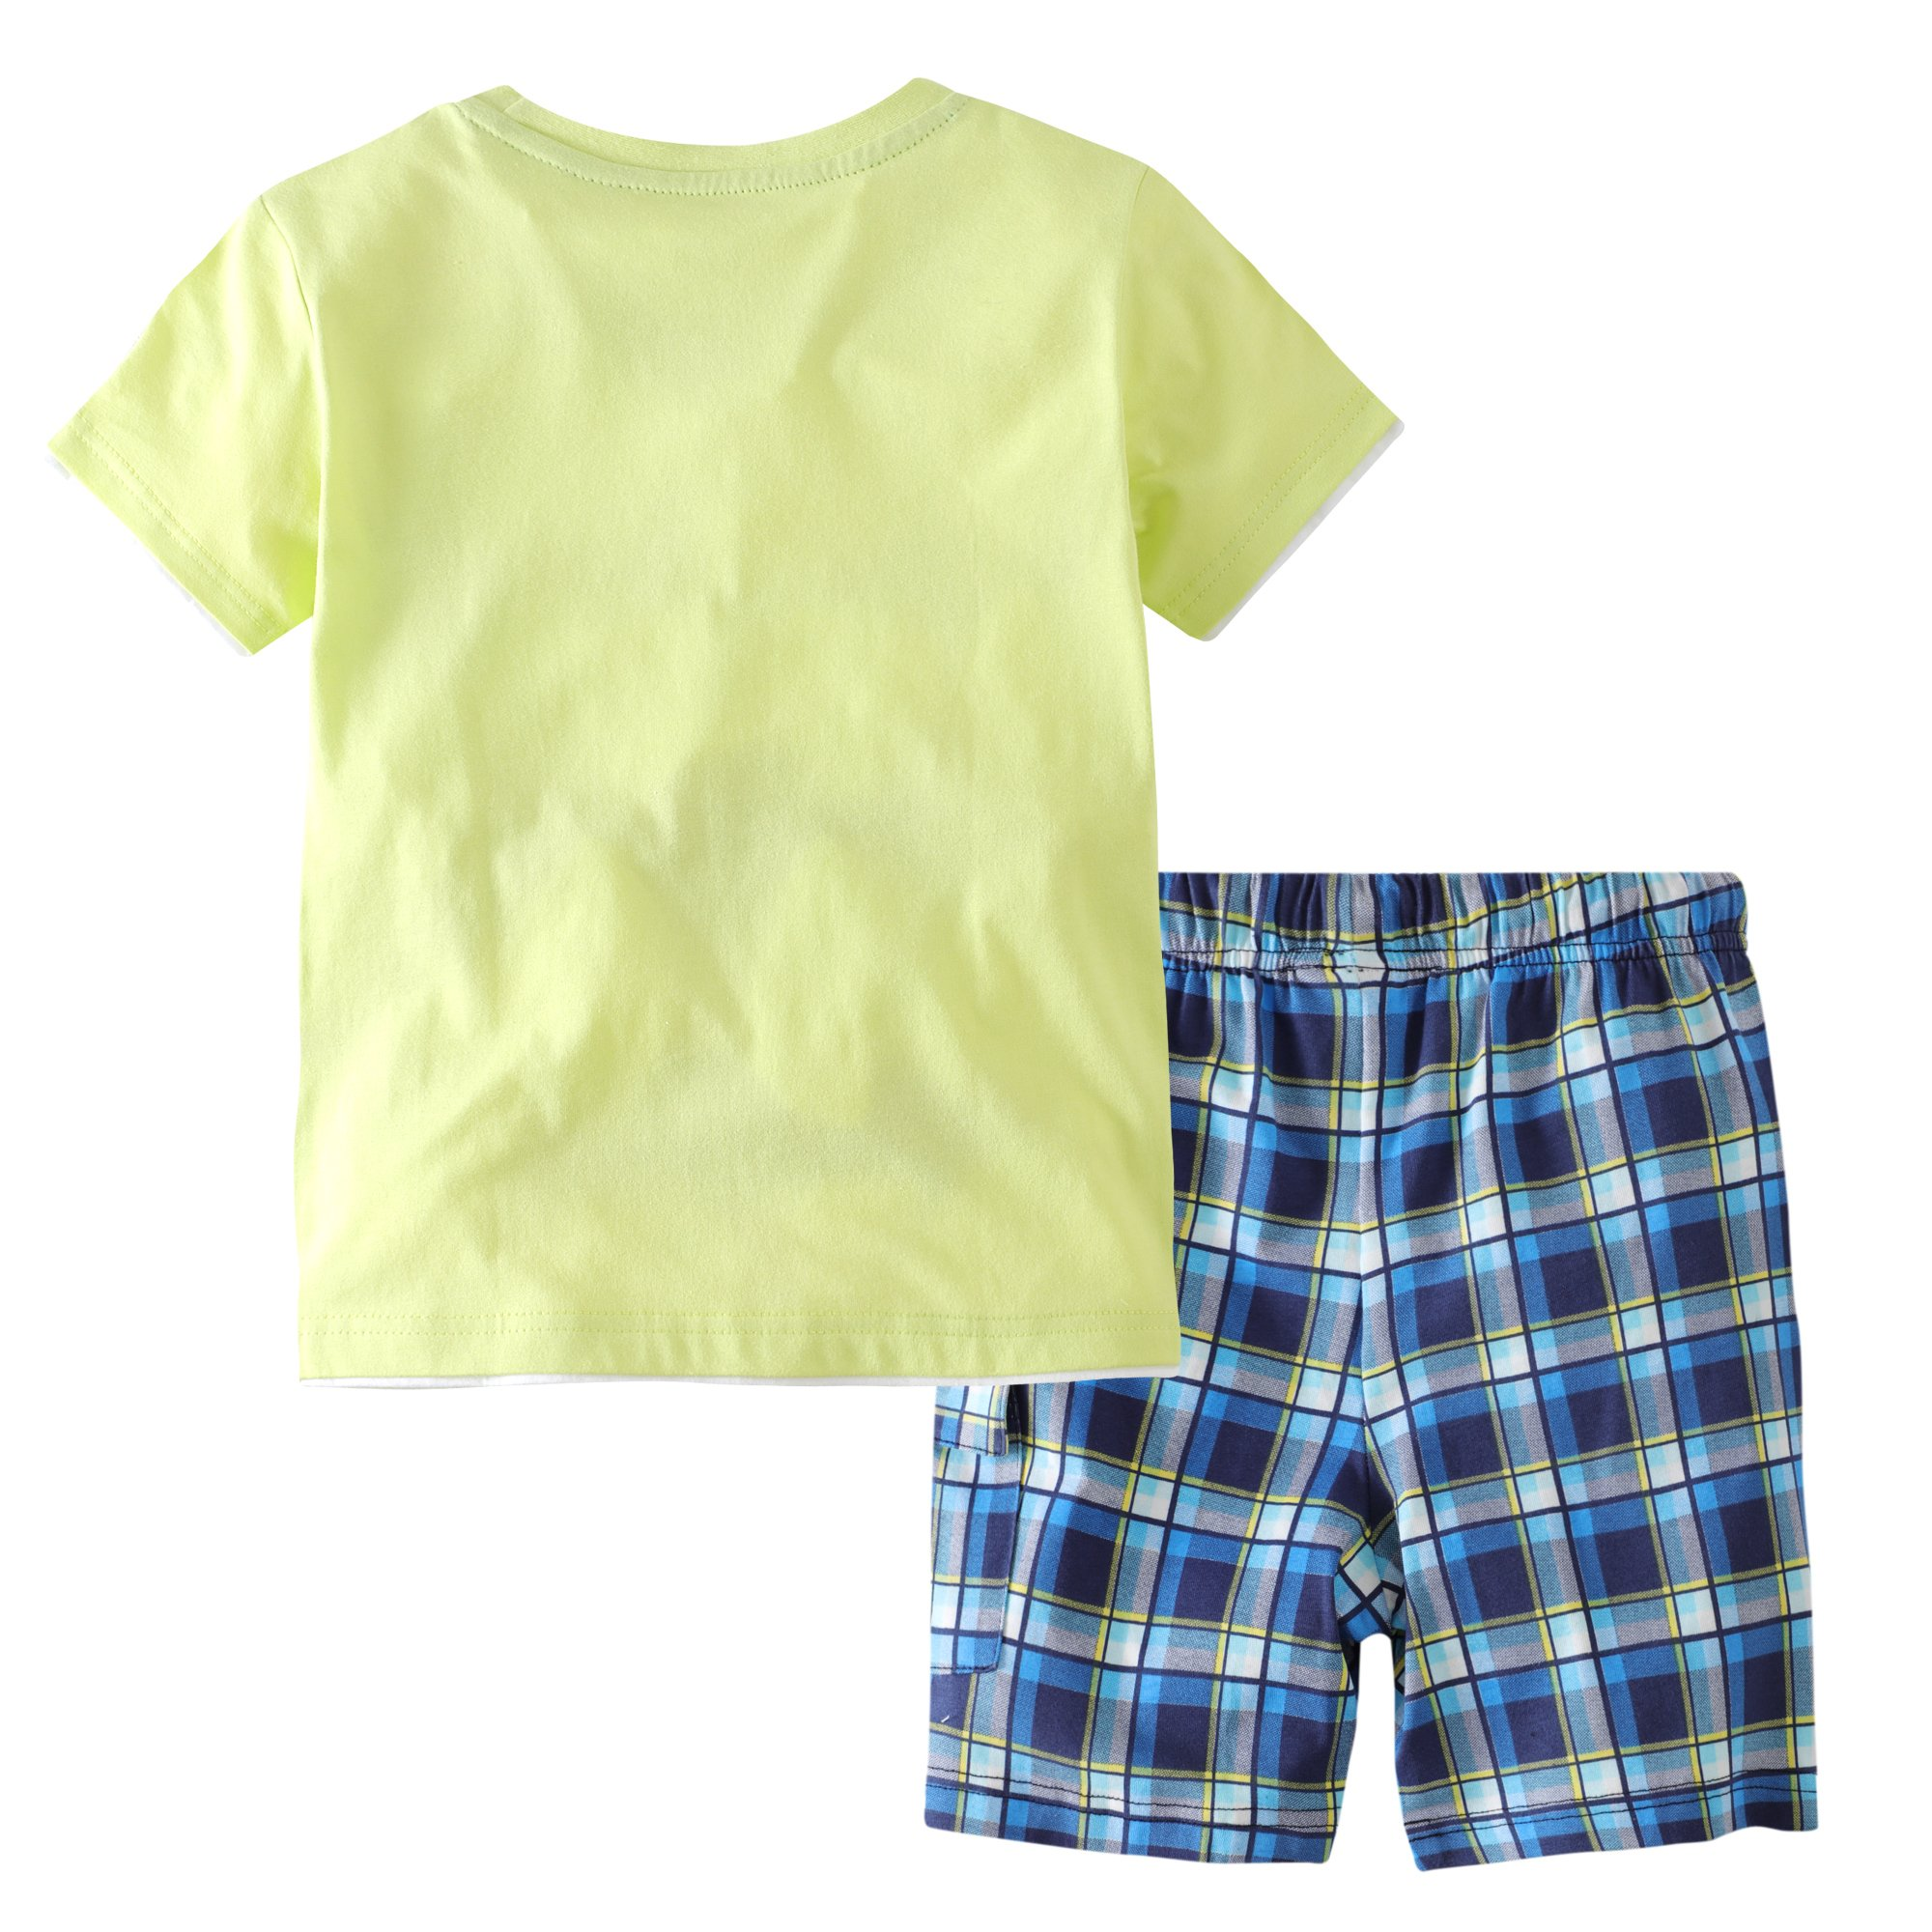 Little Bitty Little Boy Short Set Summer Cotton Clothing Set Essential Shorts Set by Little Bitty (Image #2)